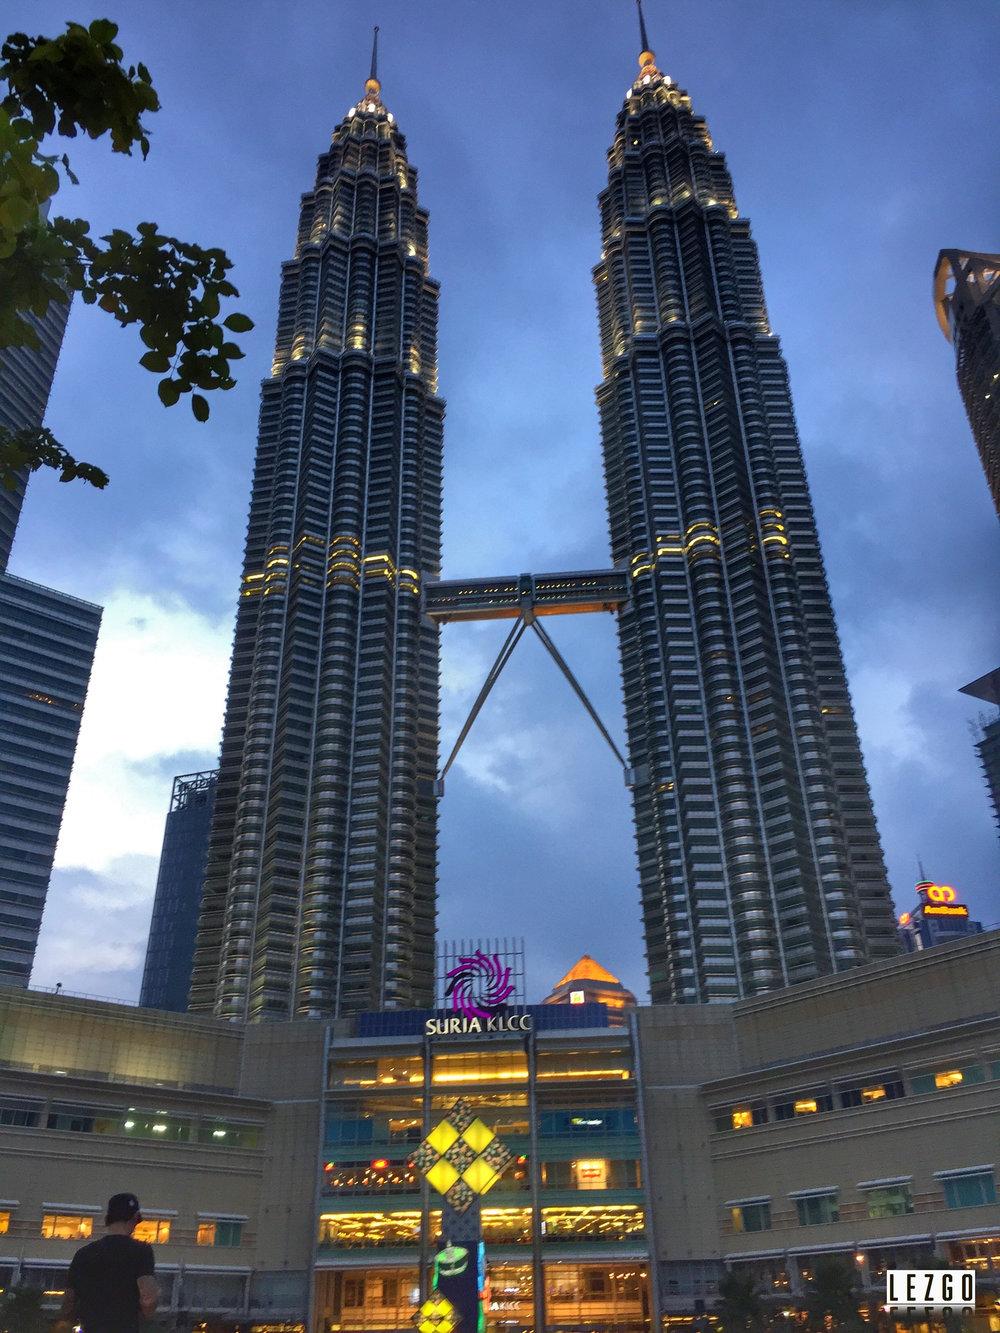 Petronas Towers, Kuala Lumpur, Malaysia June 2017